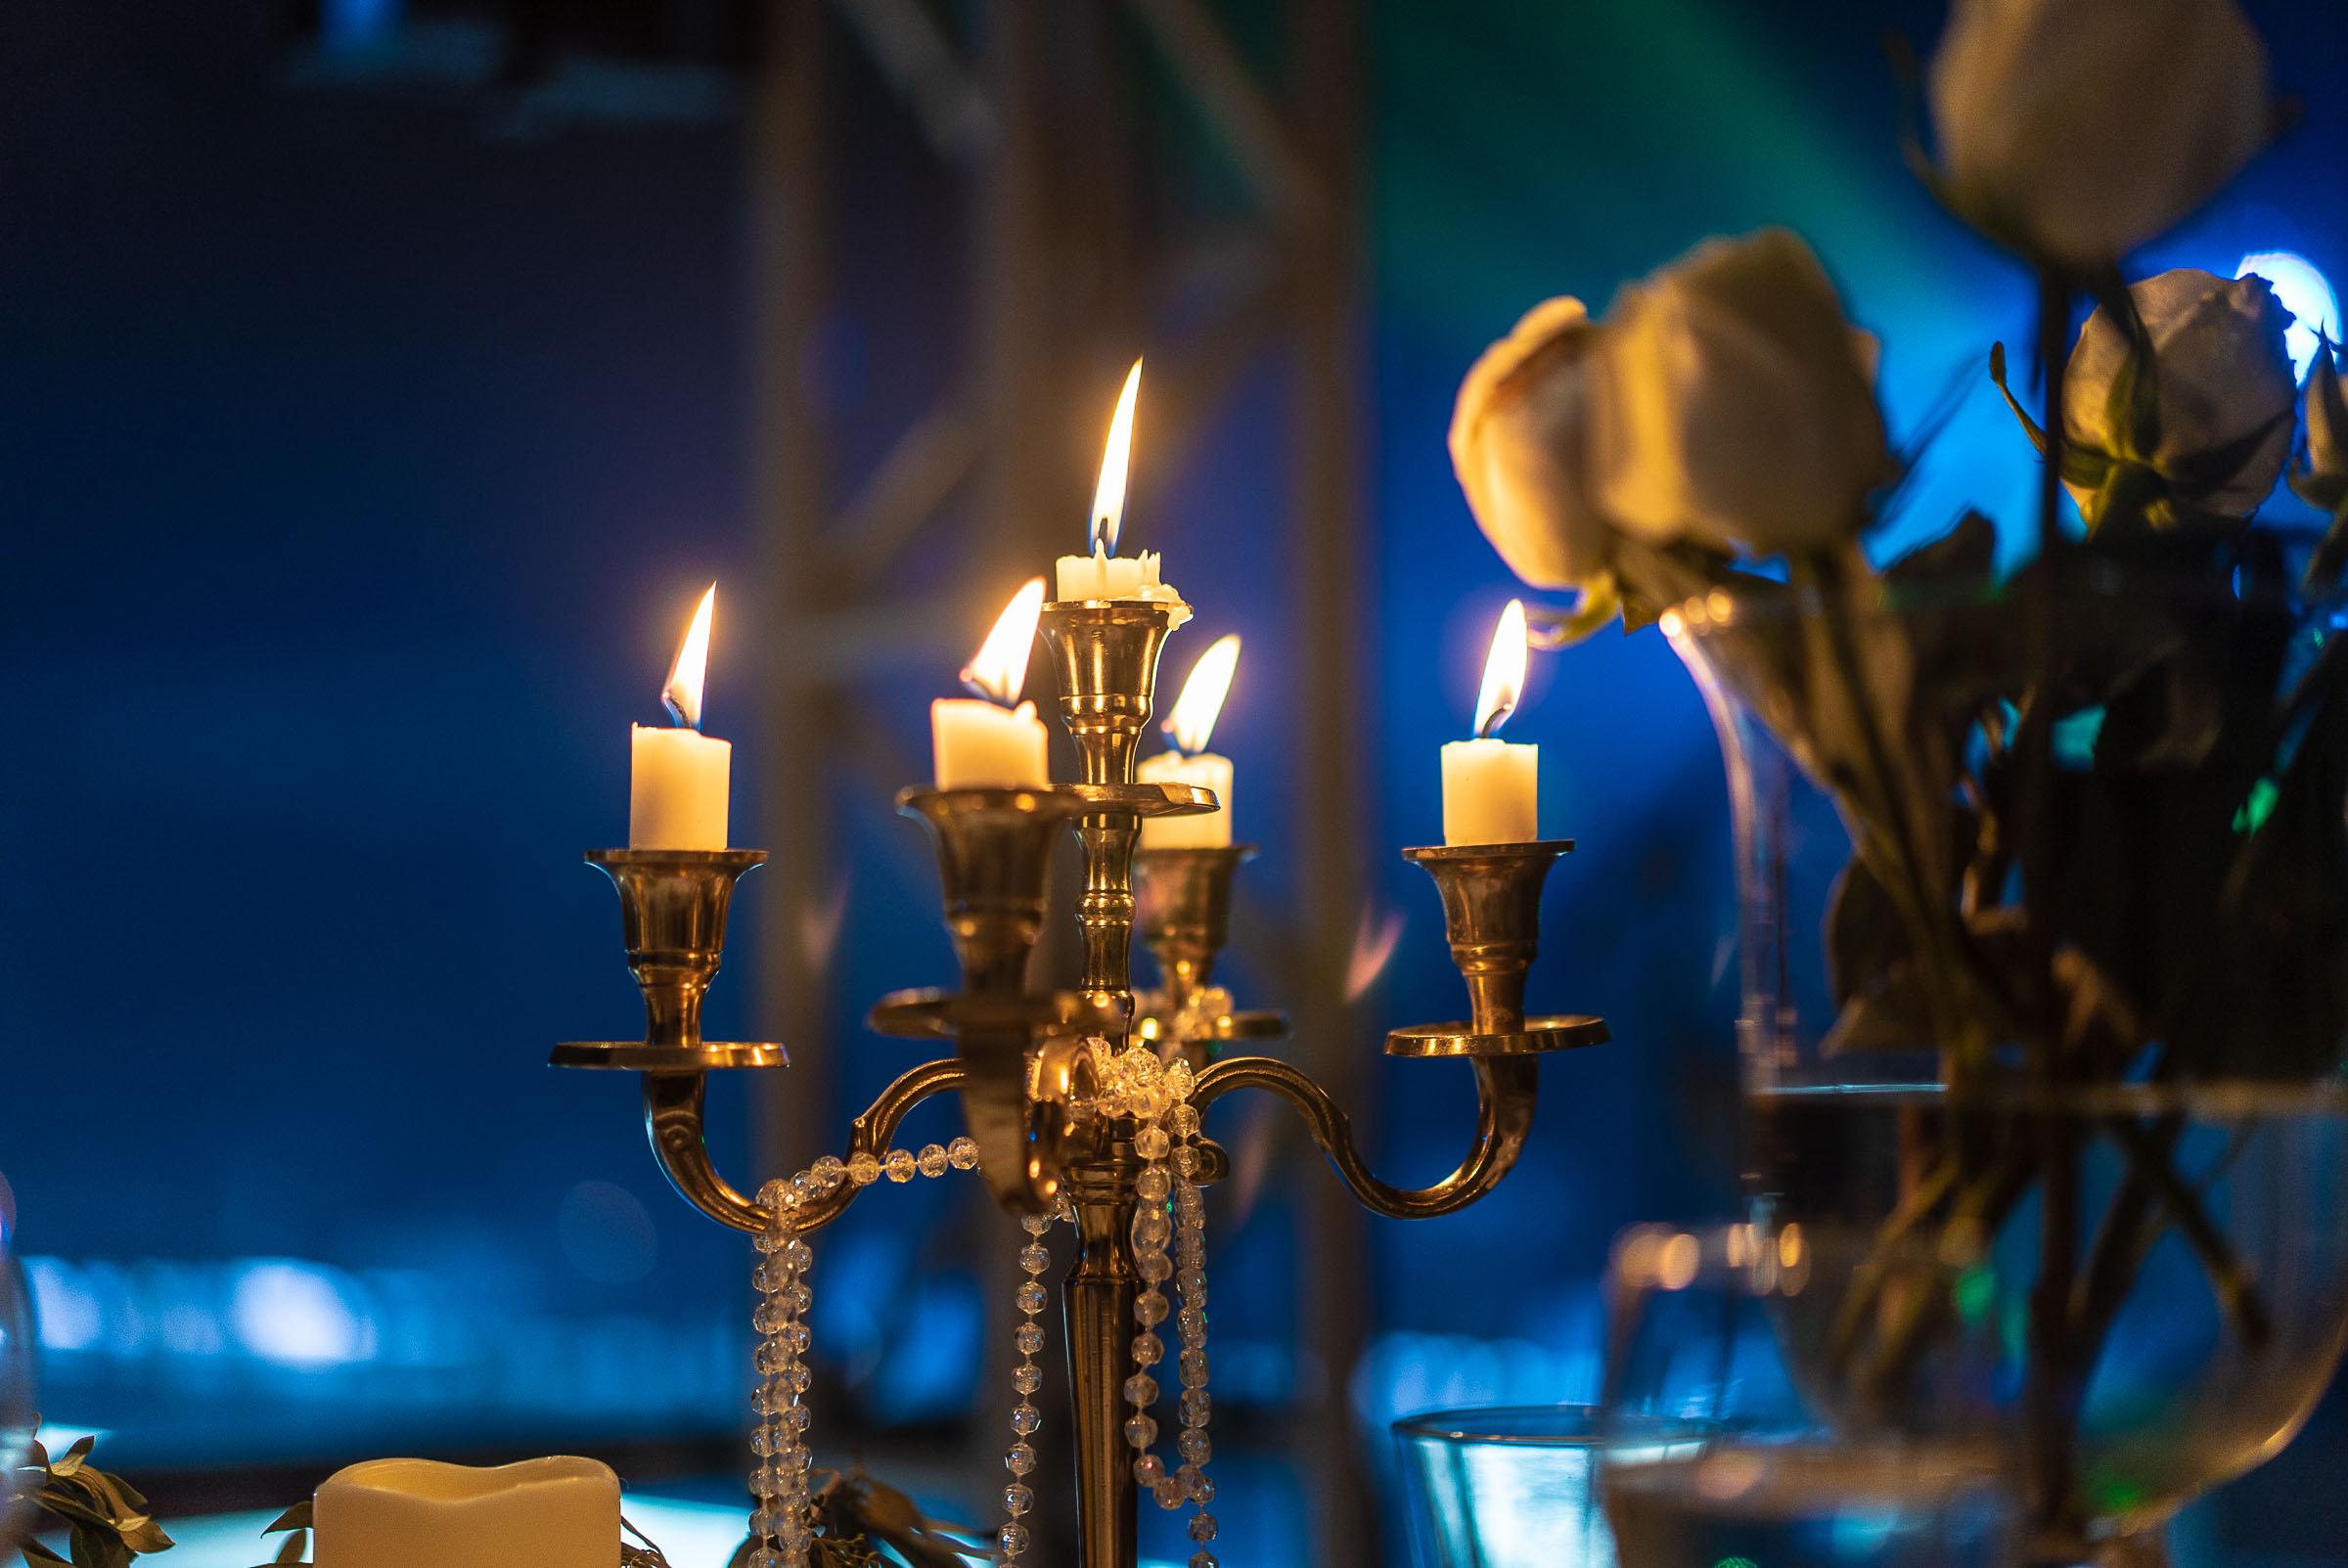 Candles burning near roses